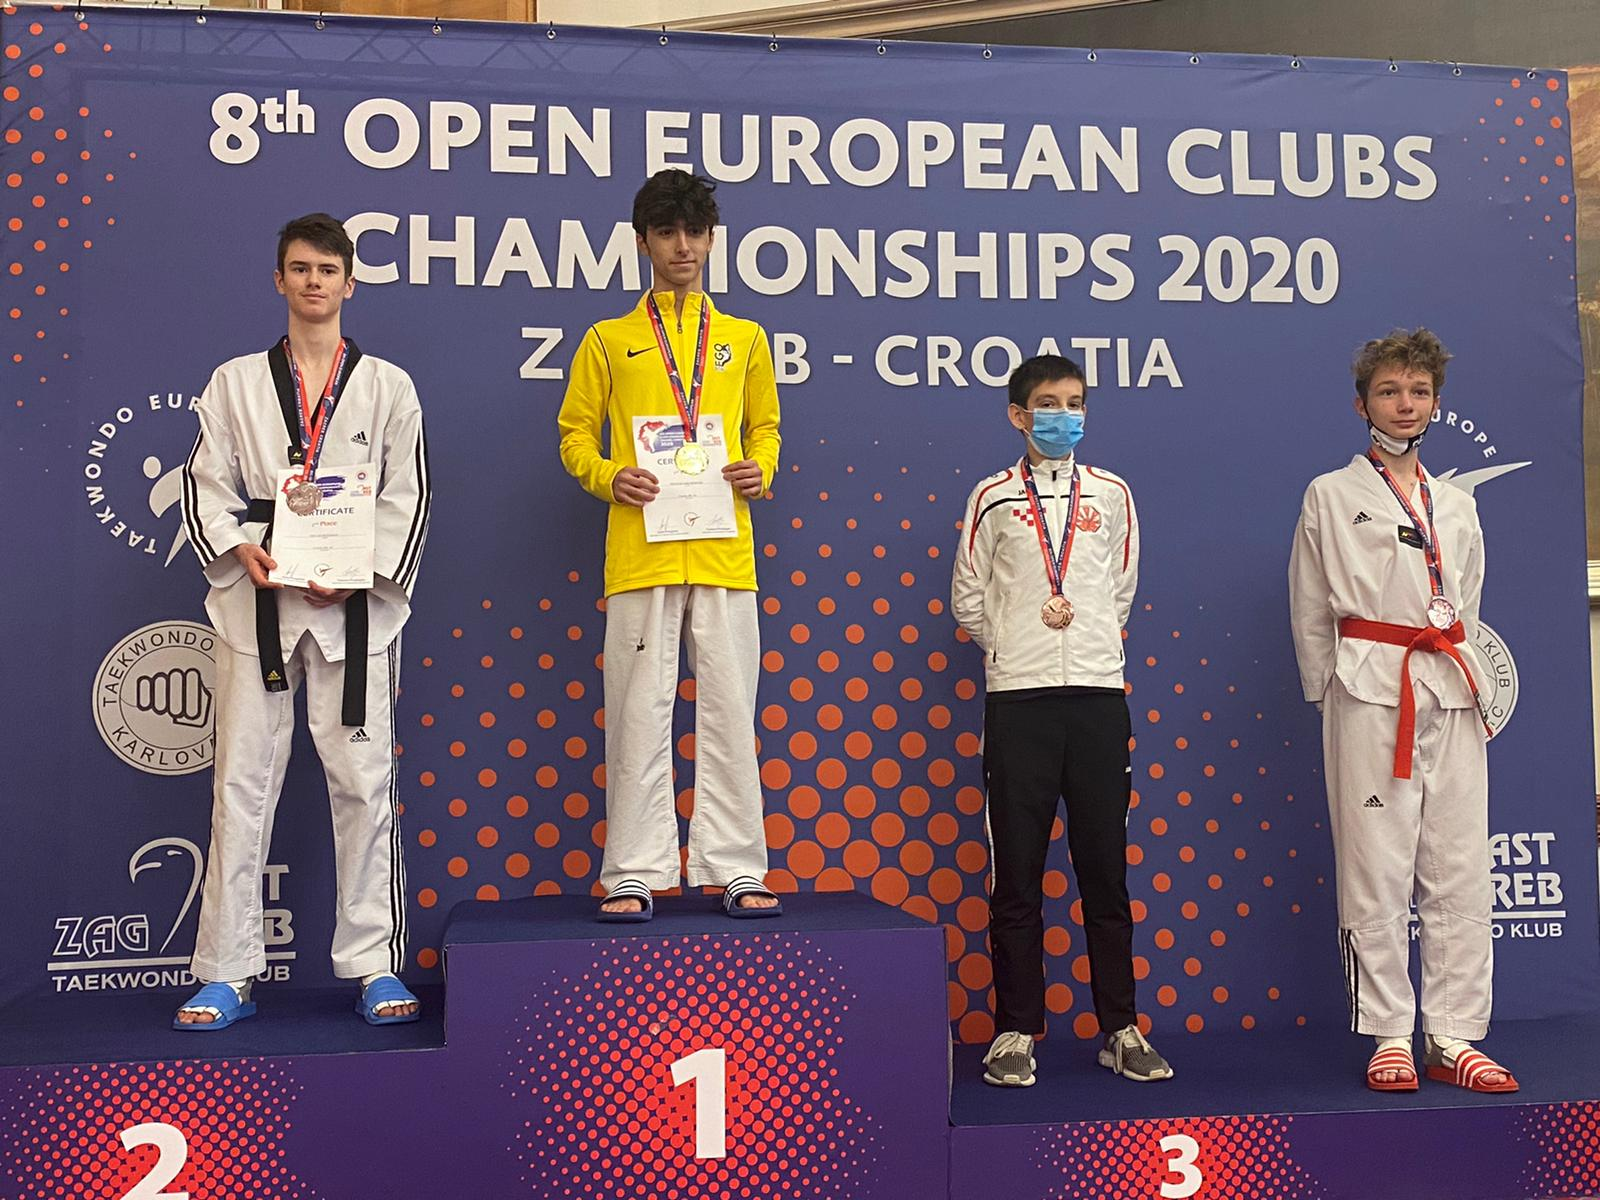 Два сребърни медала за българските таекуондисти в Загреб